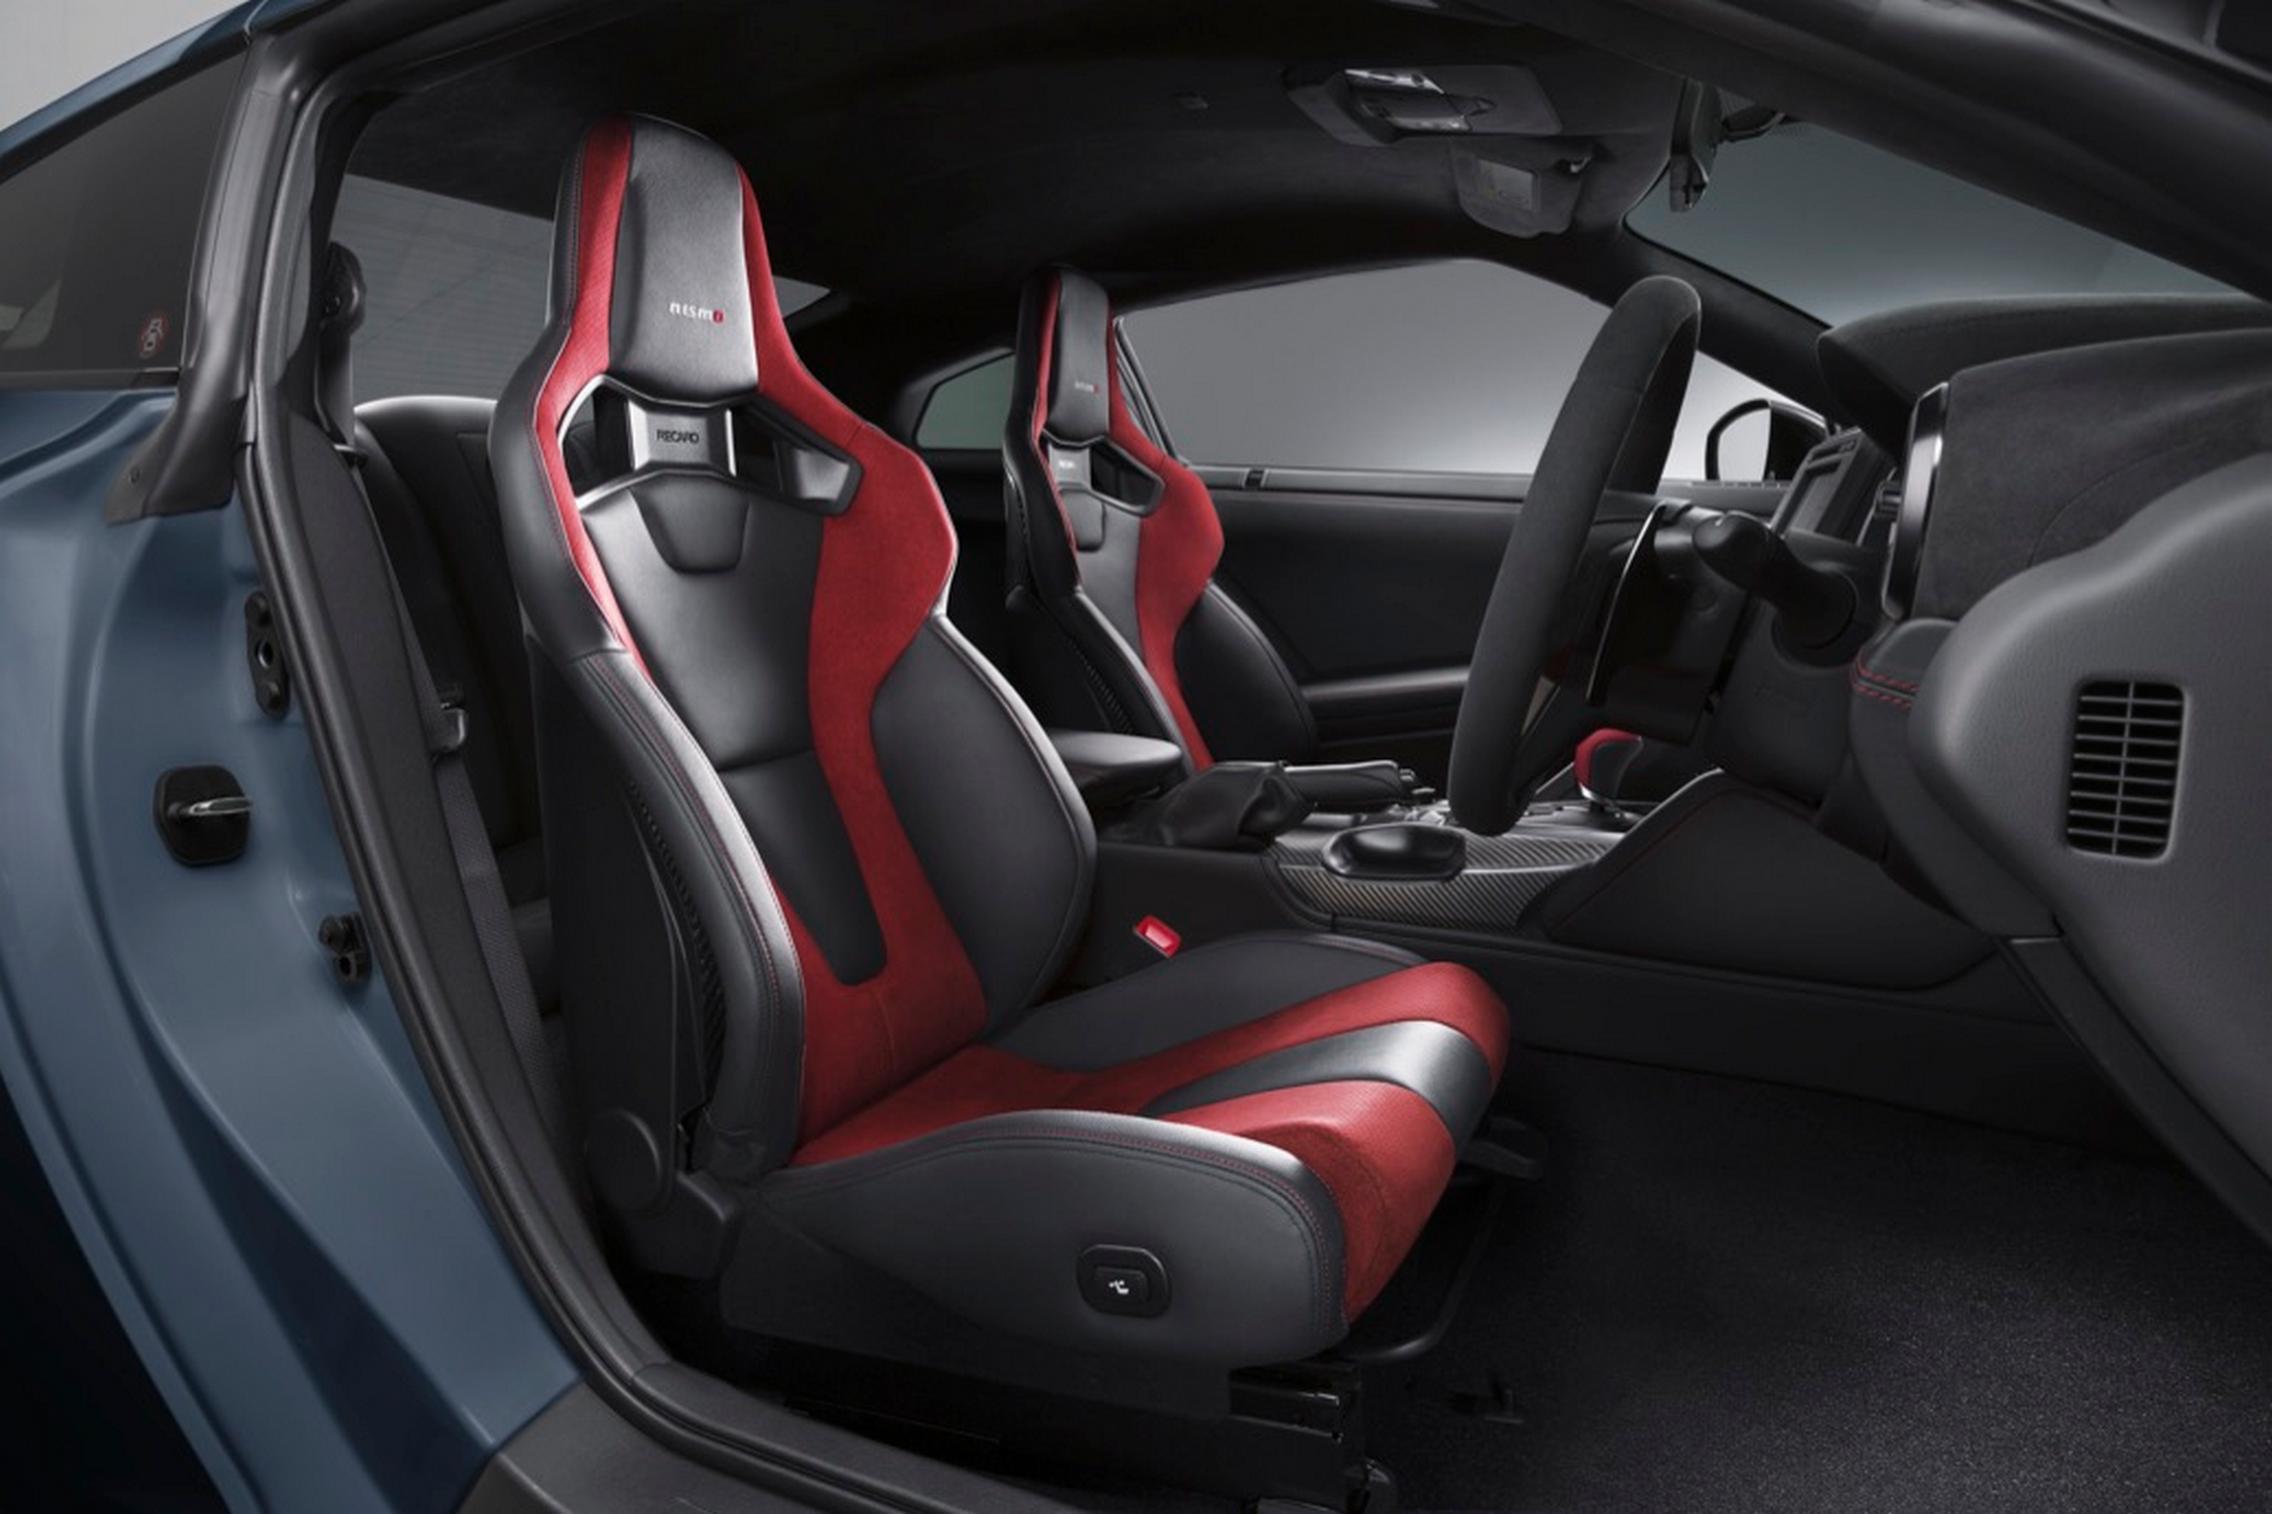 2022 Nissan GT-R Nismo seats